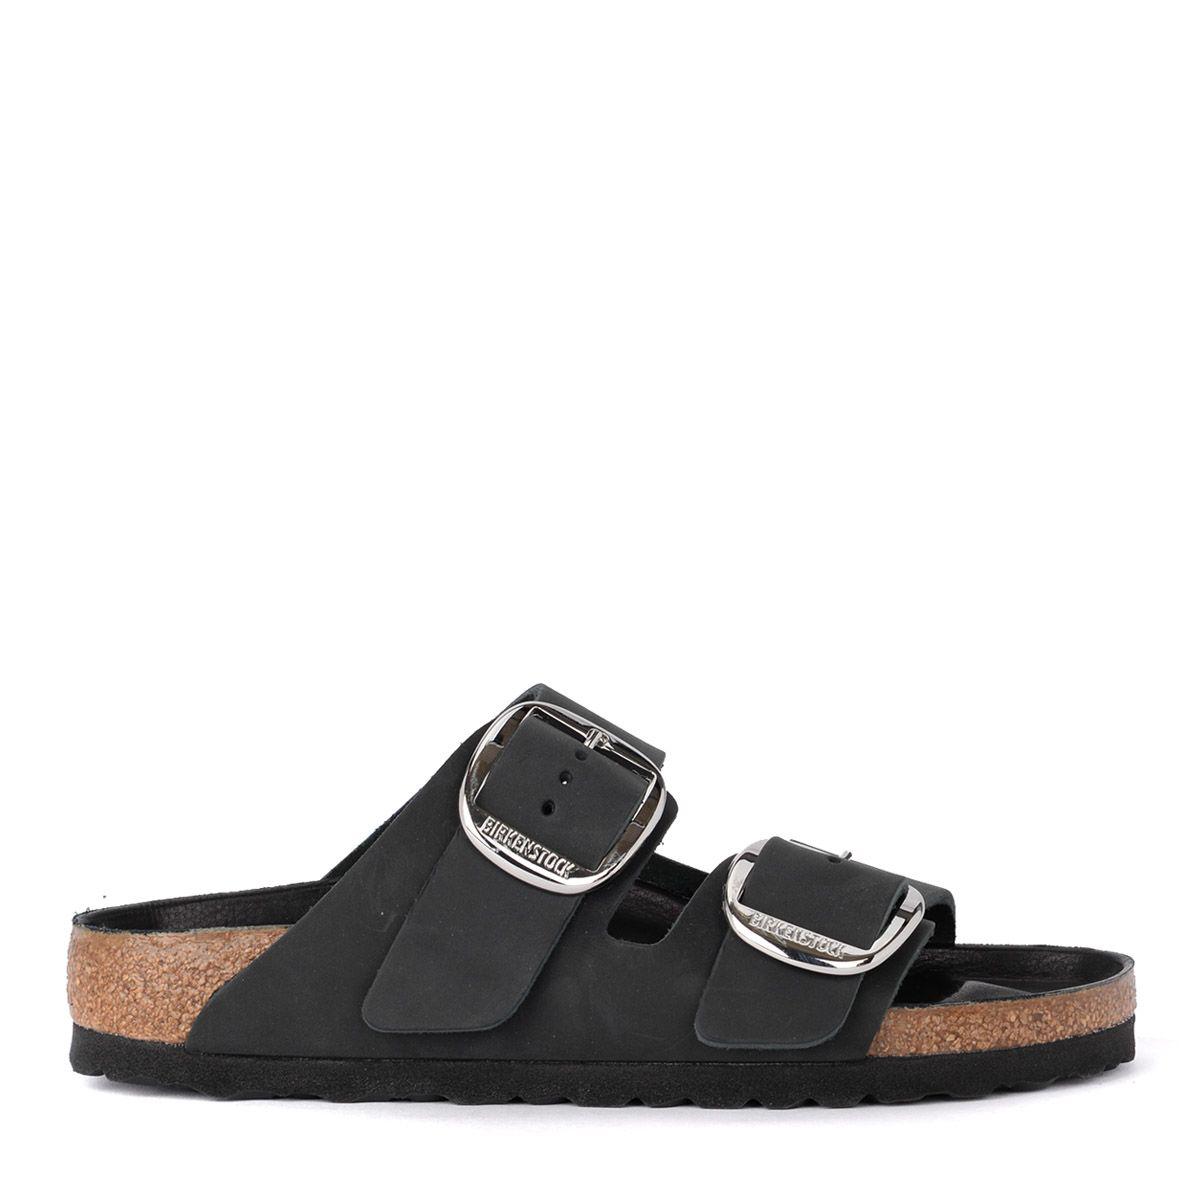 Birkenstock Arizona Big Buckle Black Leather Sandal